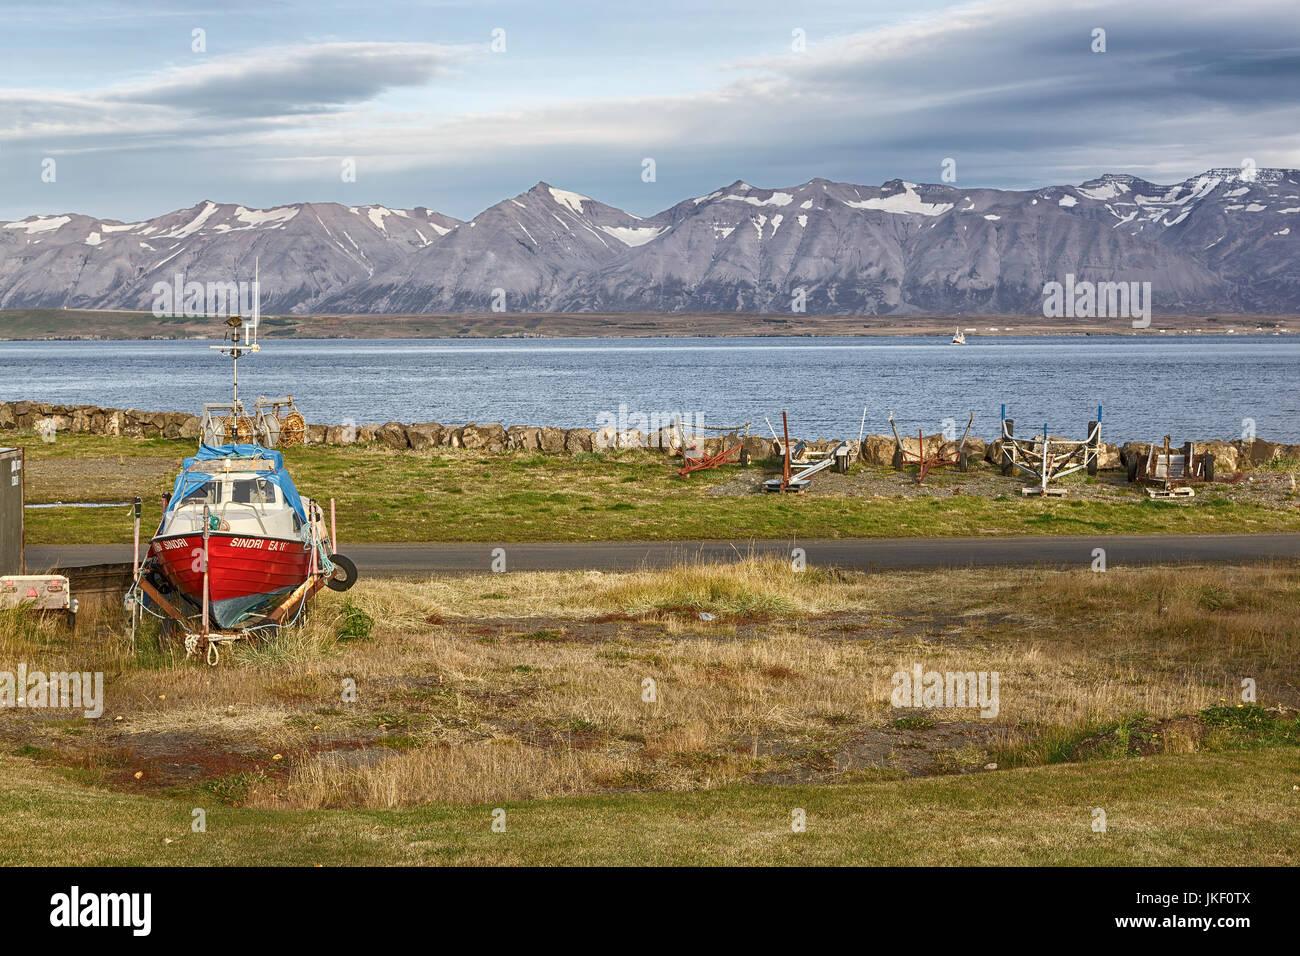 Un chantier naval du nord de l'Islande Photo Stock